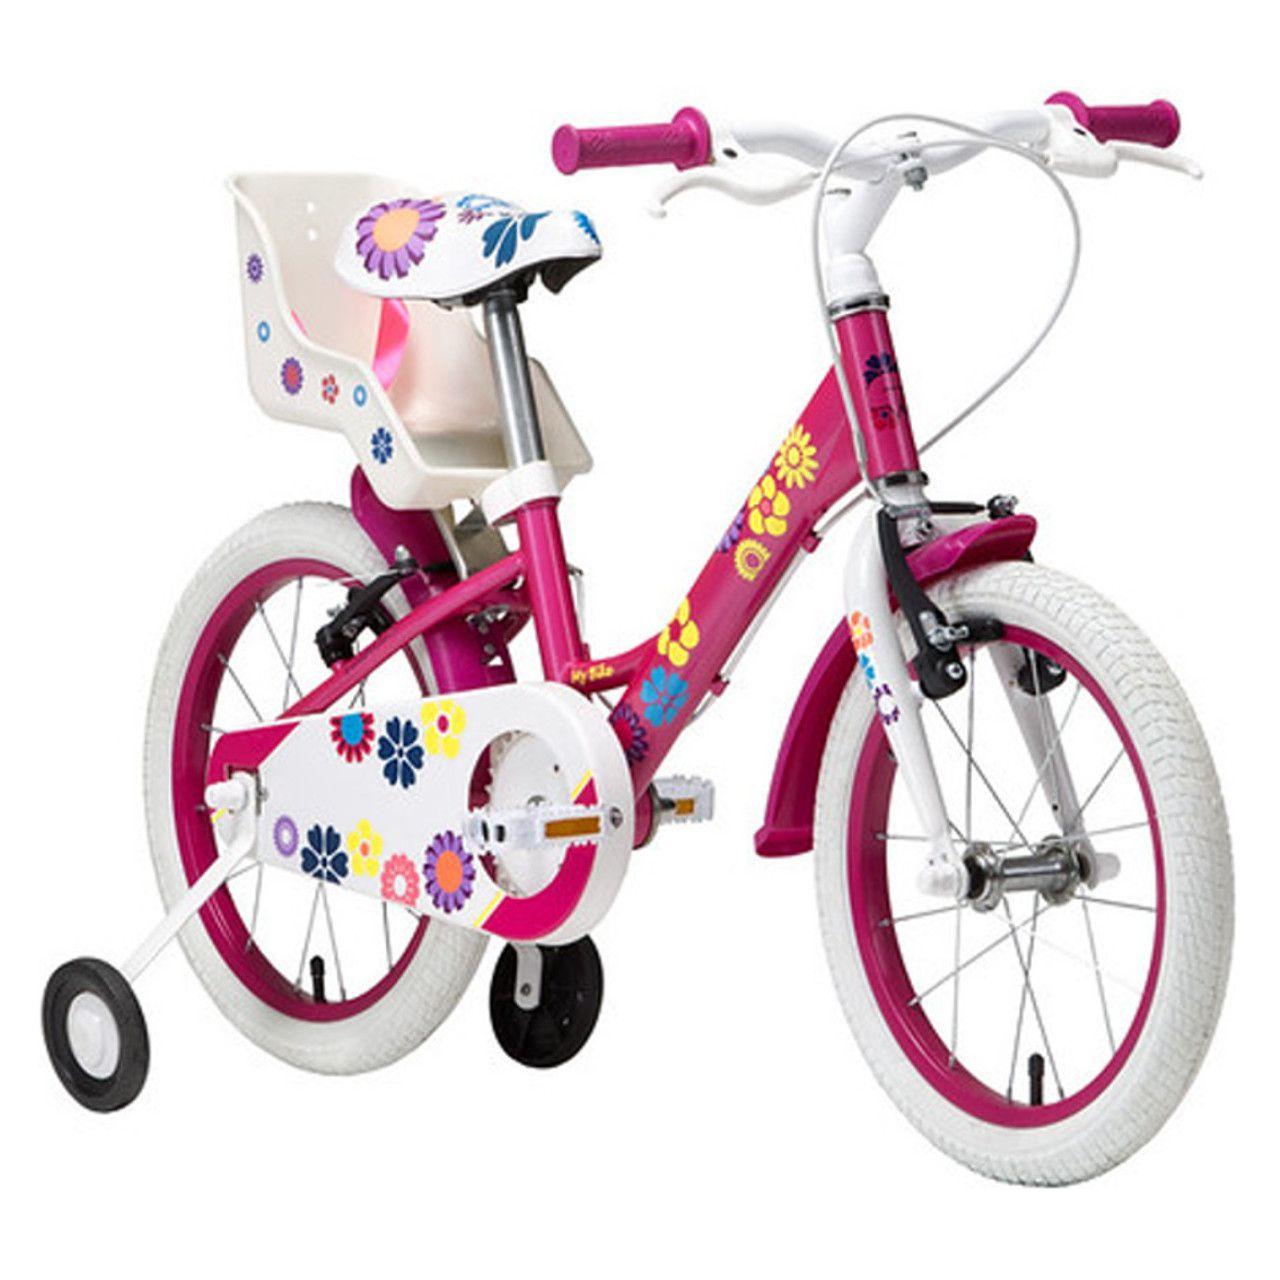 Bicicleta Infantil Groove My Bike com Porta Boneca Aro 16 2020